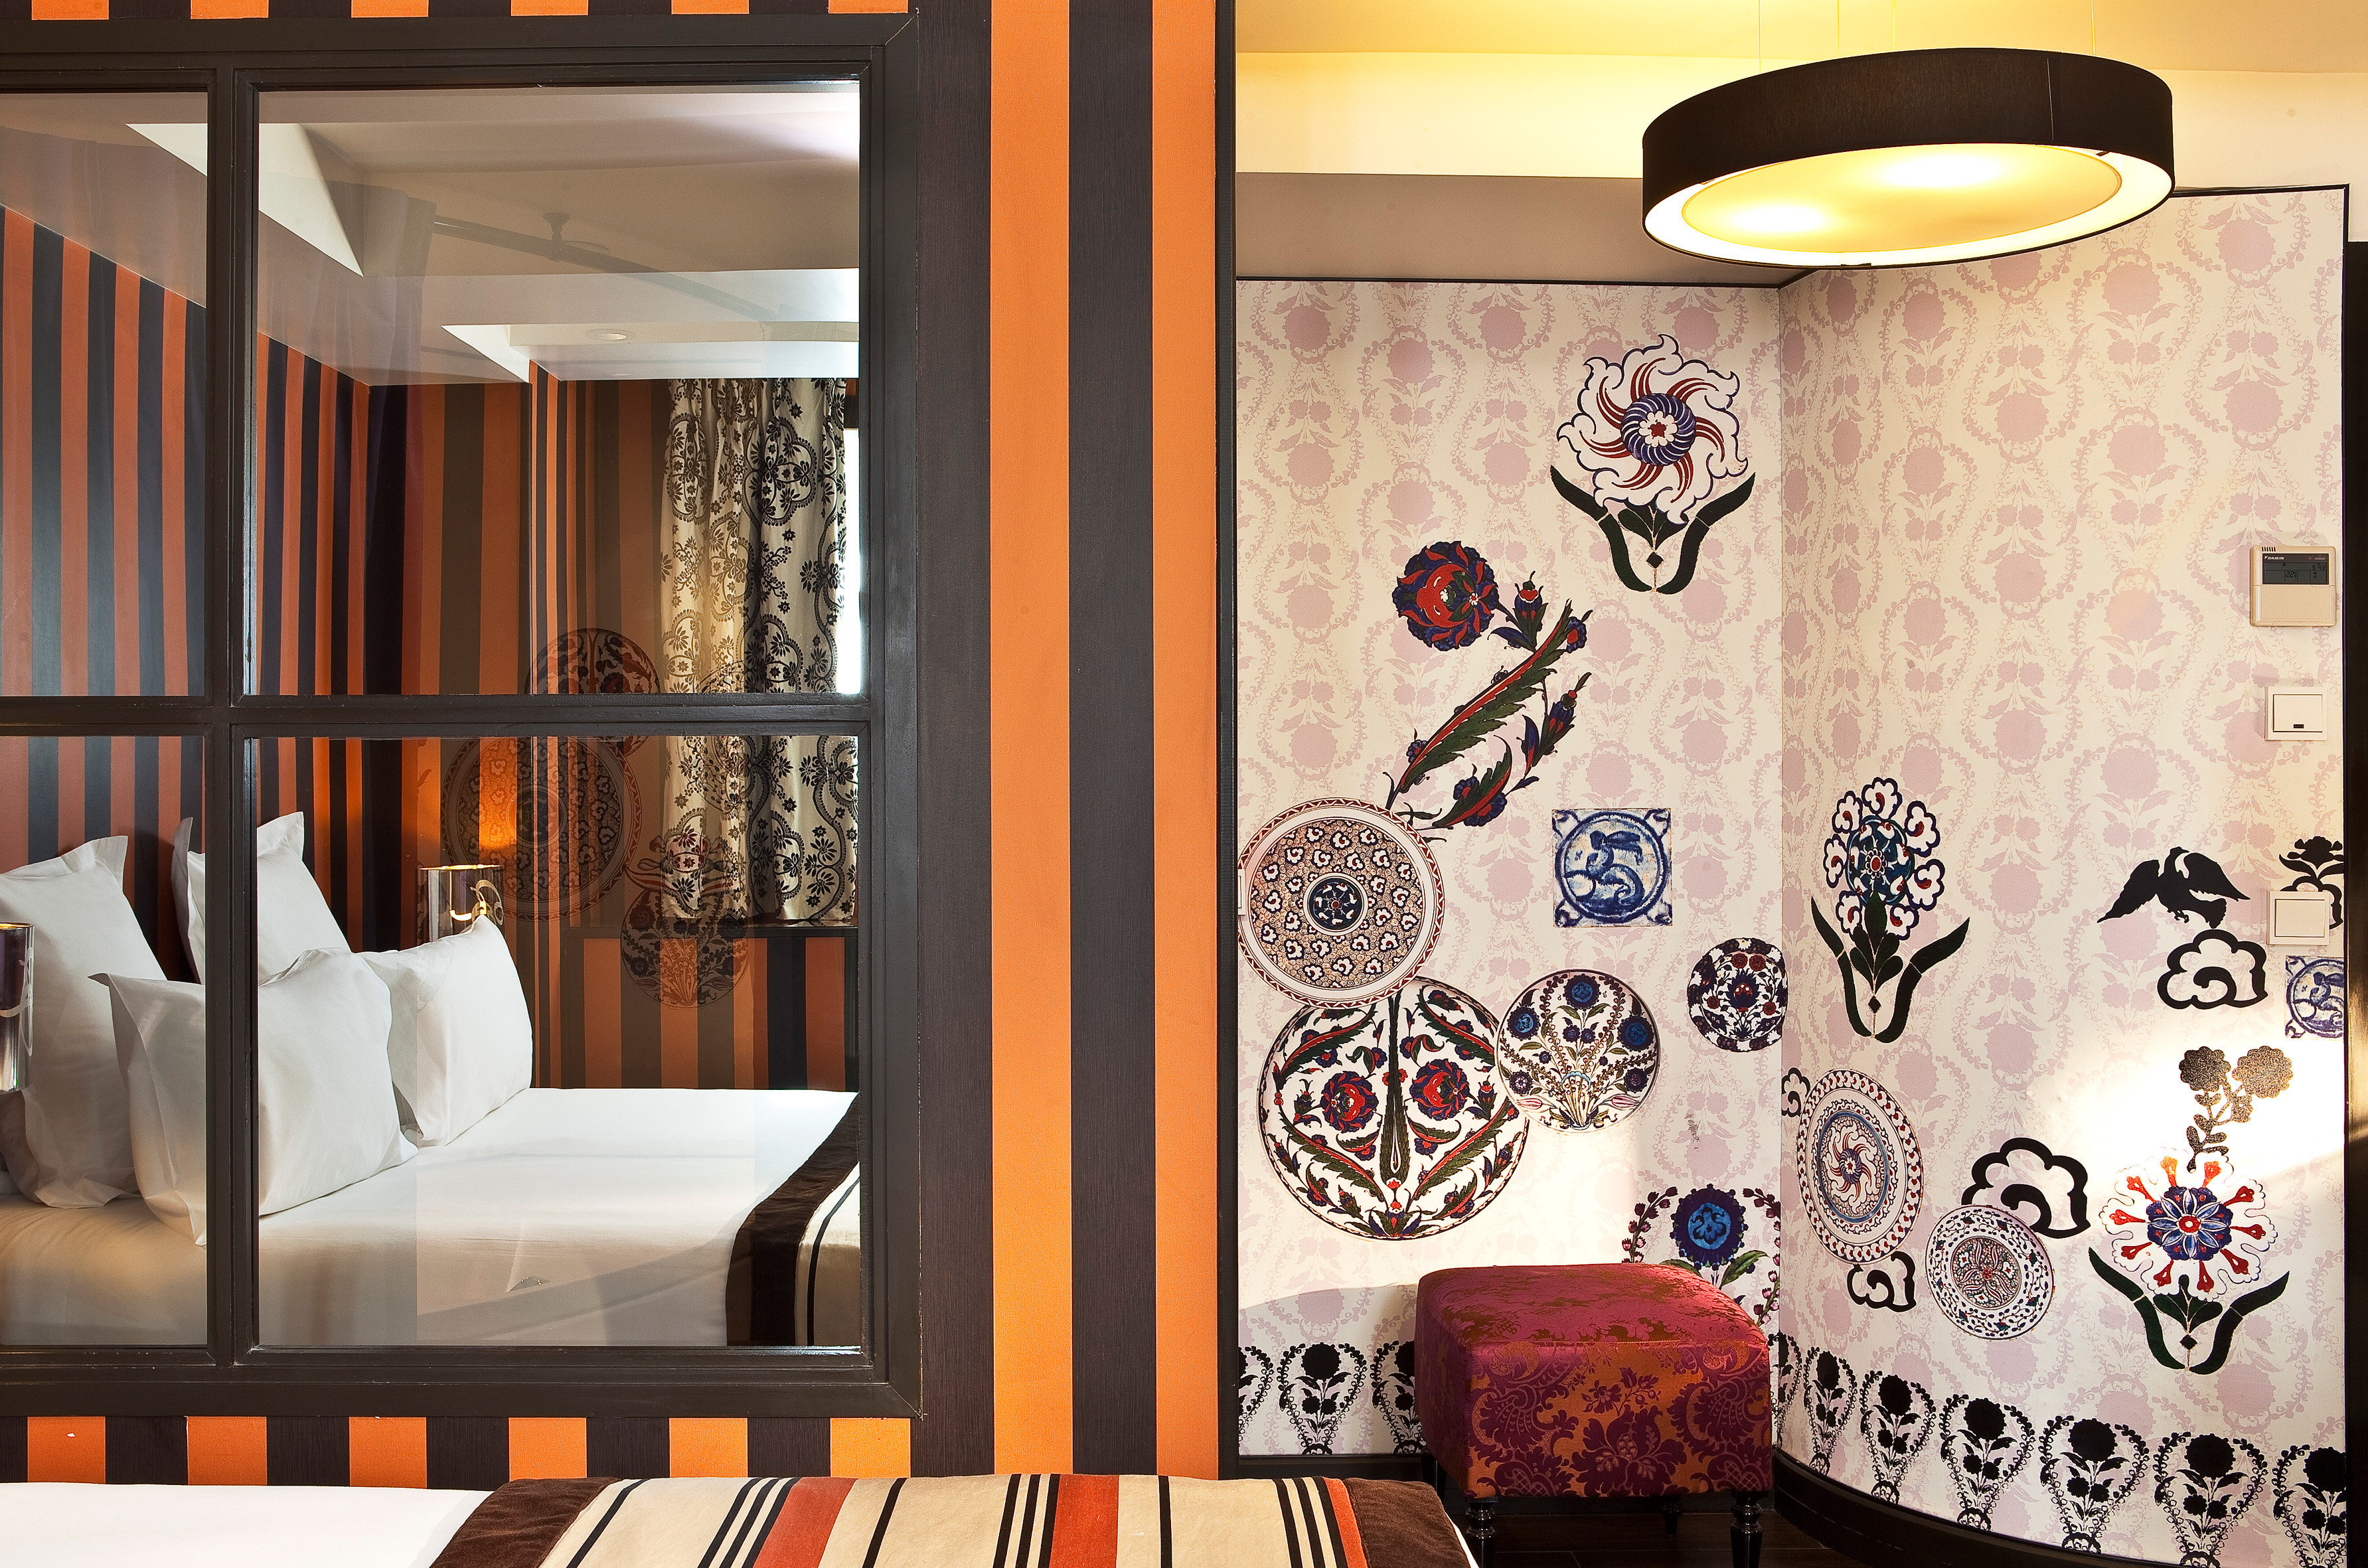 Bedroom Elegant Luxury Modern Romantic Suite modern art window treatment colored colorful